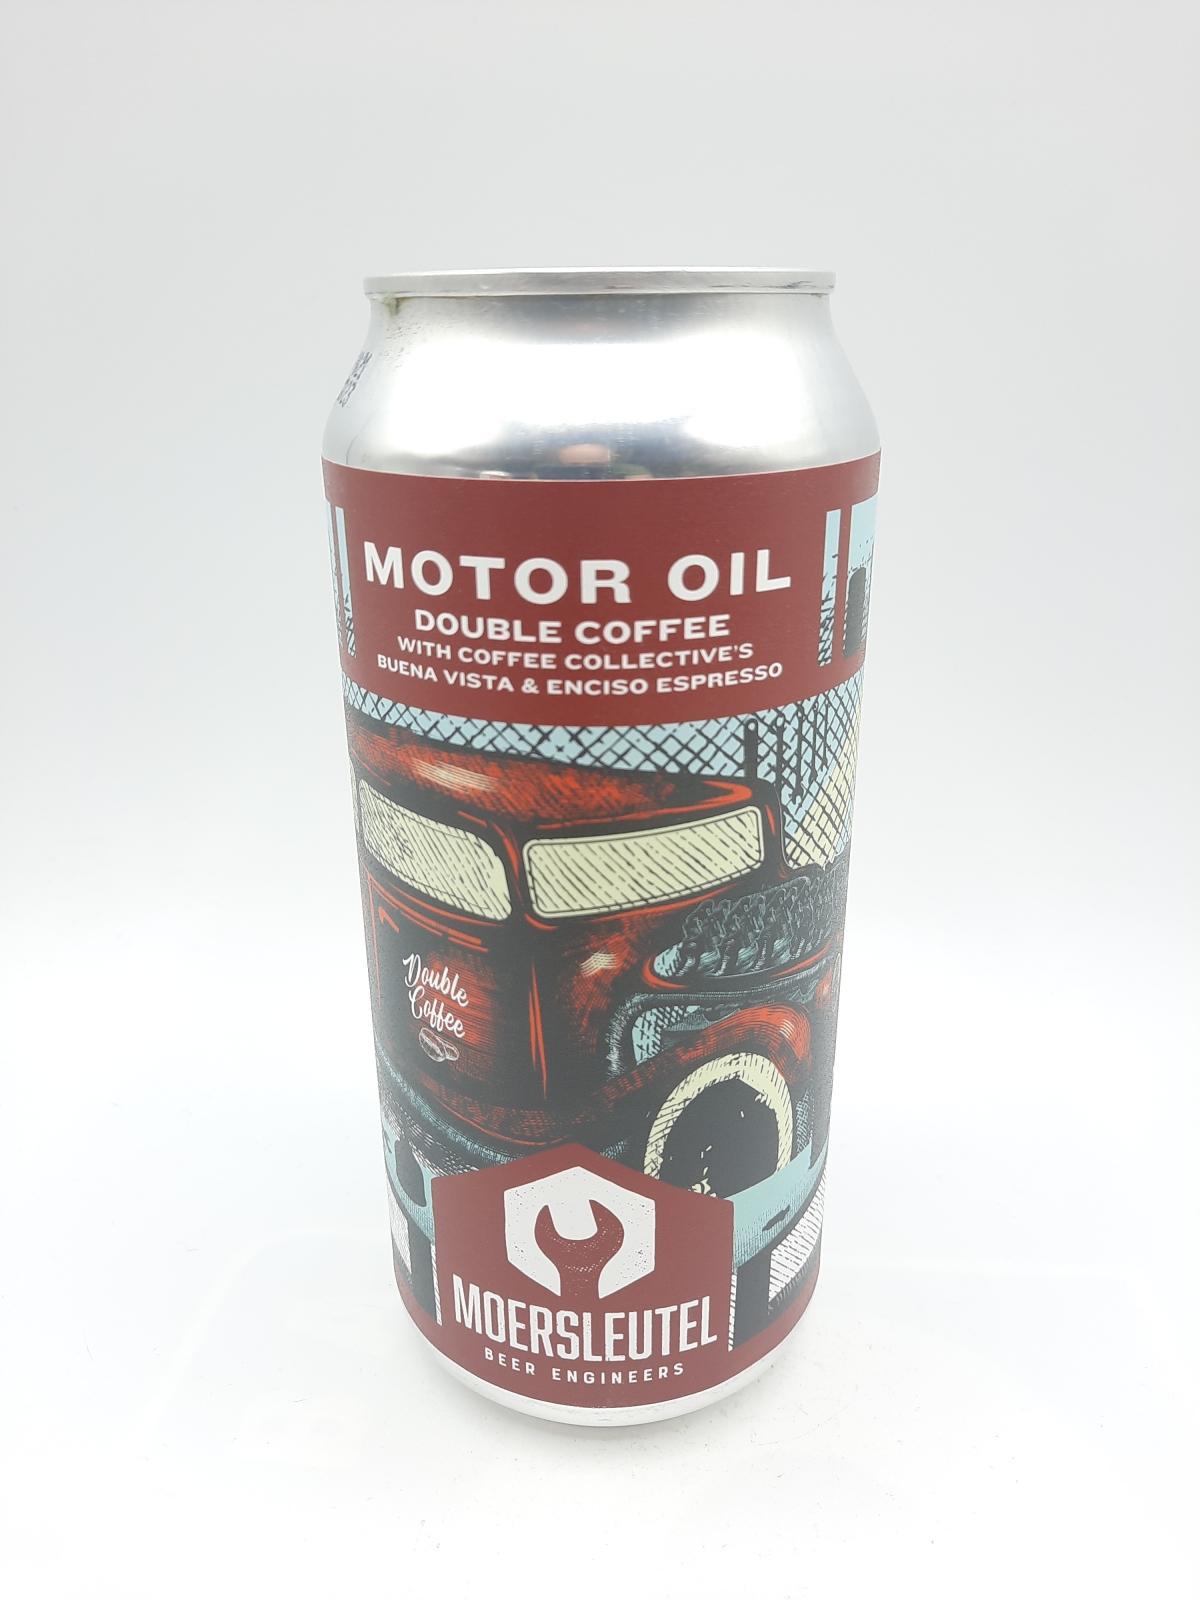 Image Motor Oil Double Coffee